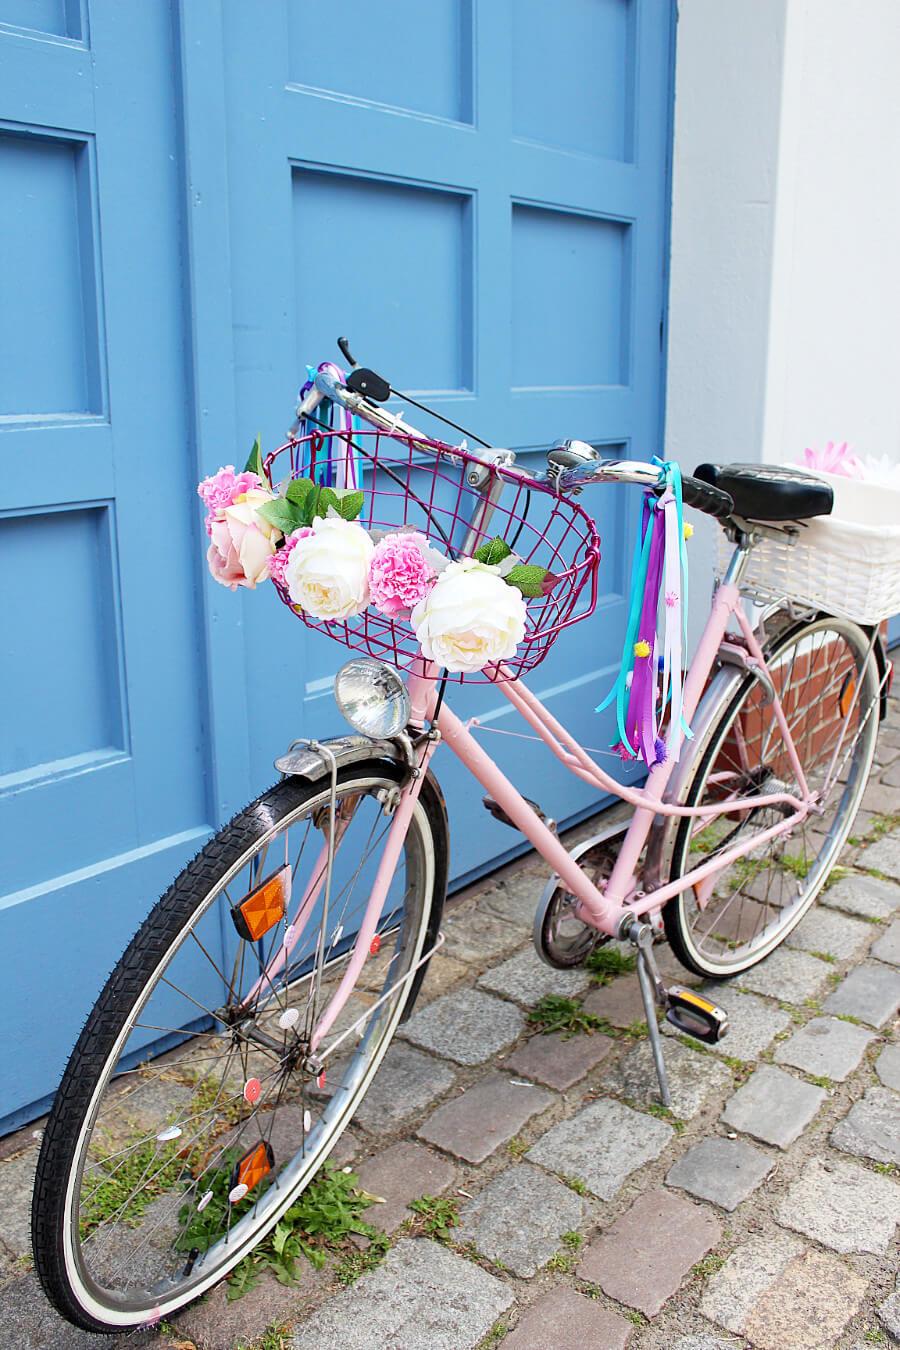 diy fahrrad upcyceln 4 geniale ideen um dein fahrrad aufzupimpen. Black Bedroom Furniture Sets. Home Design Ideas